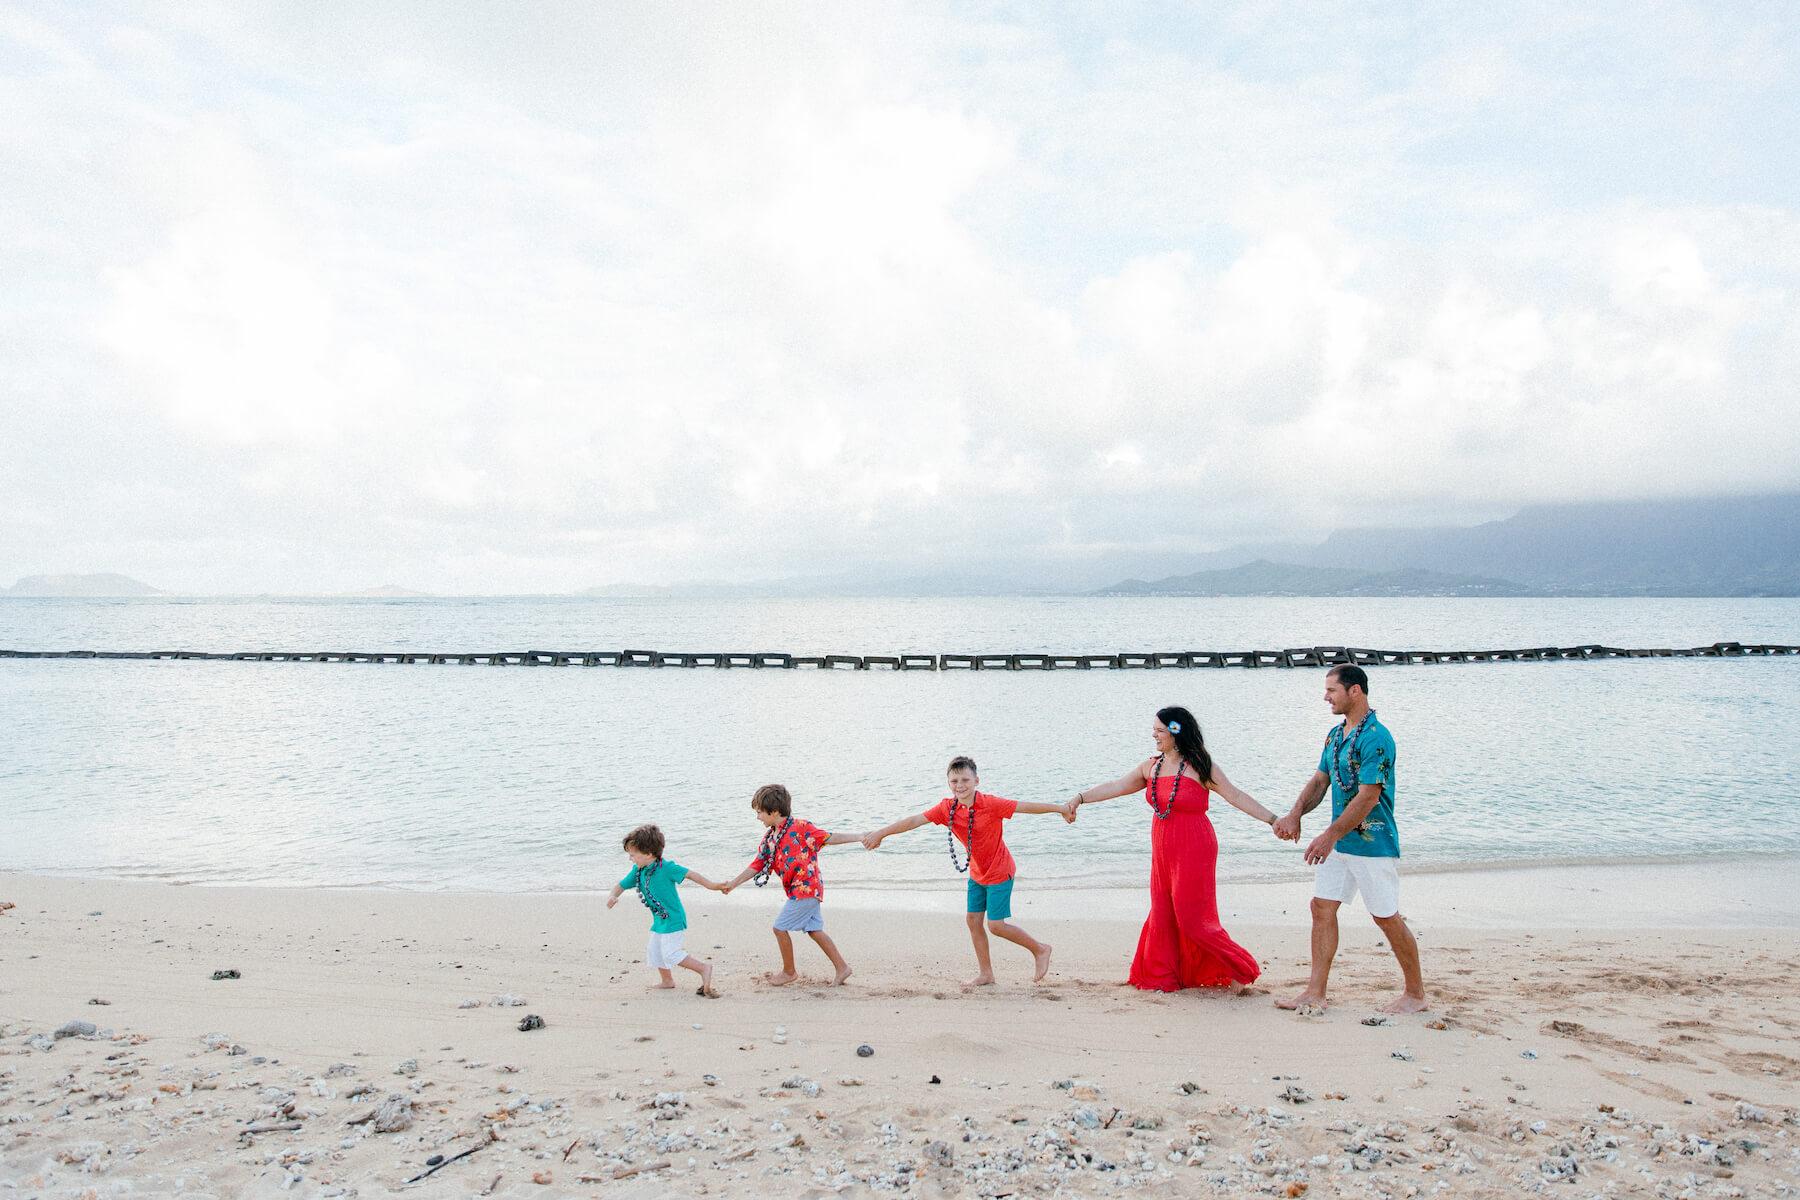 honolulu-05-31-2019-family-trip-5_original